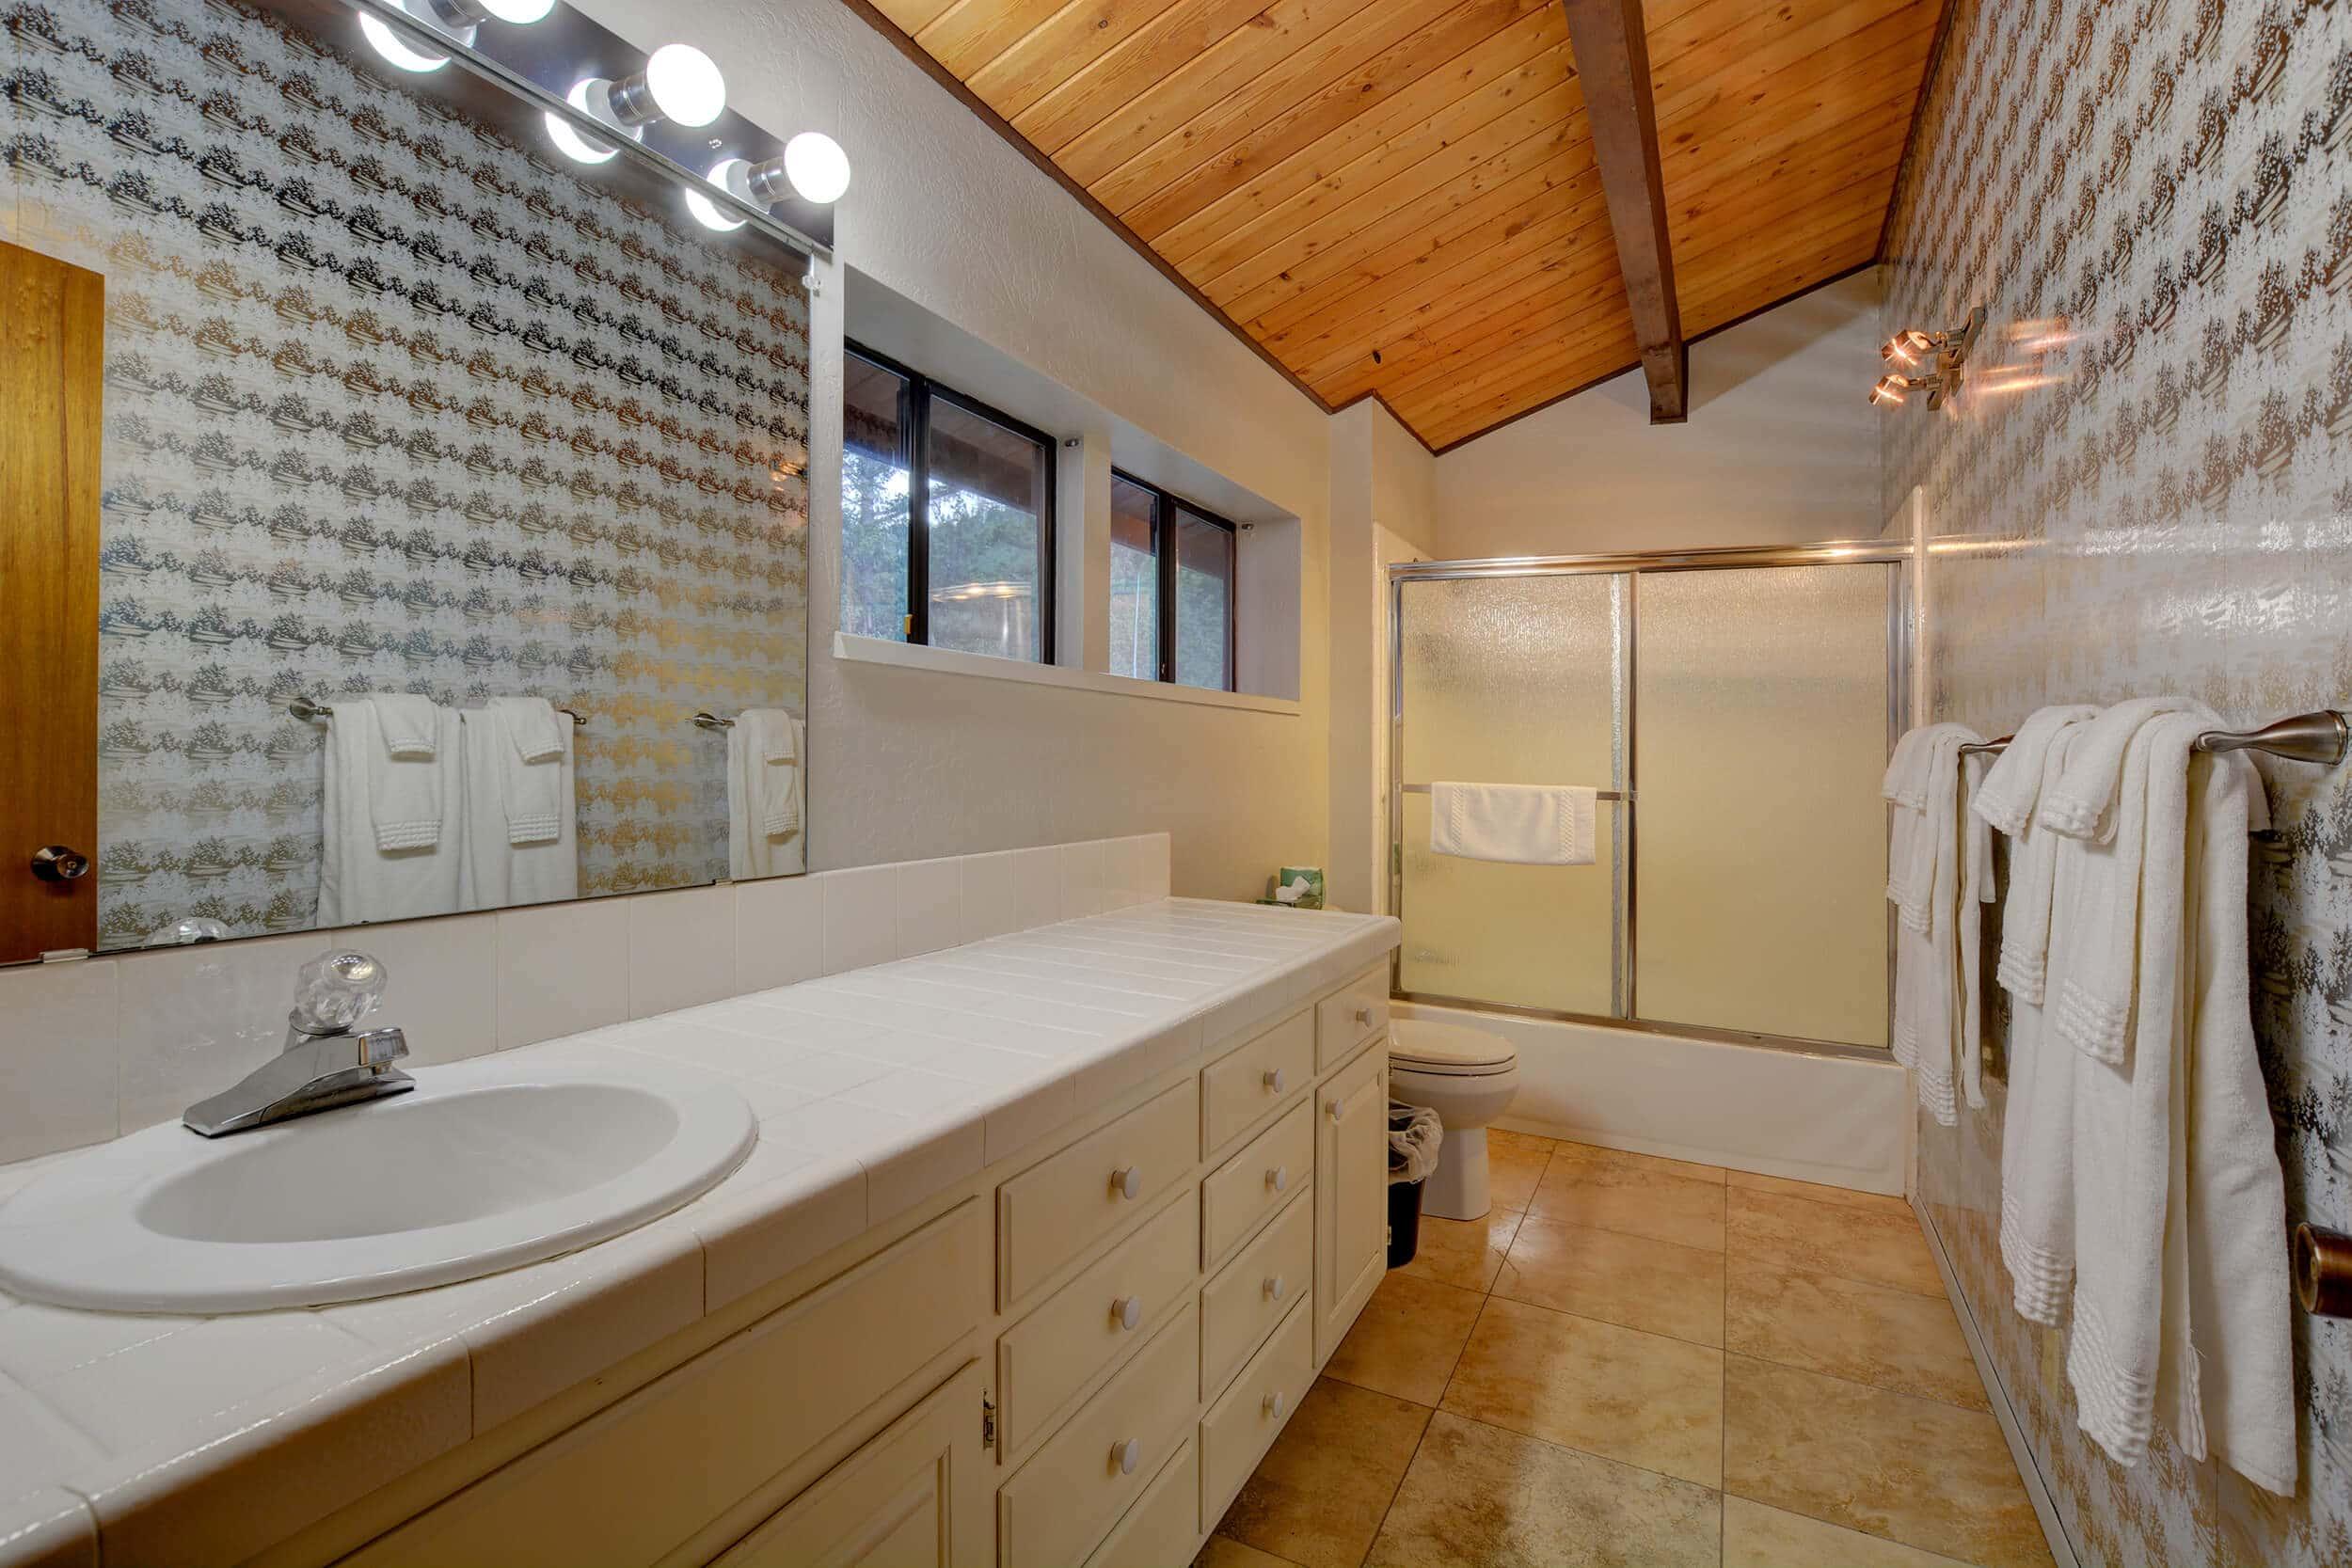 The Treetops House Lower Bathroom